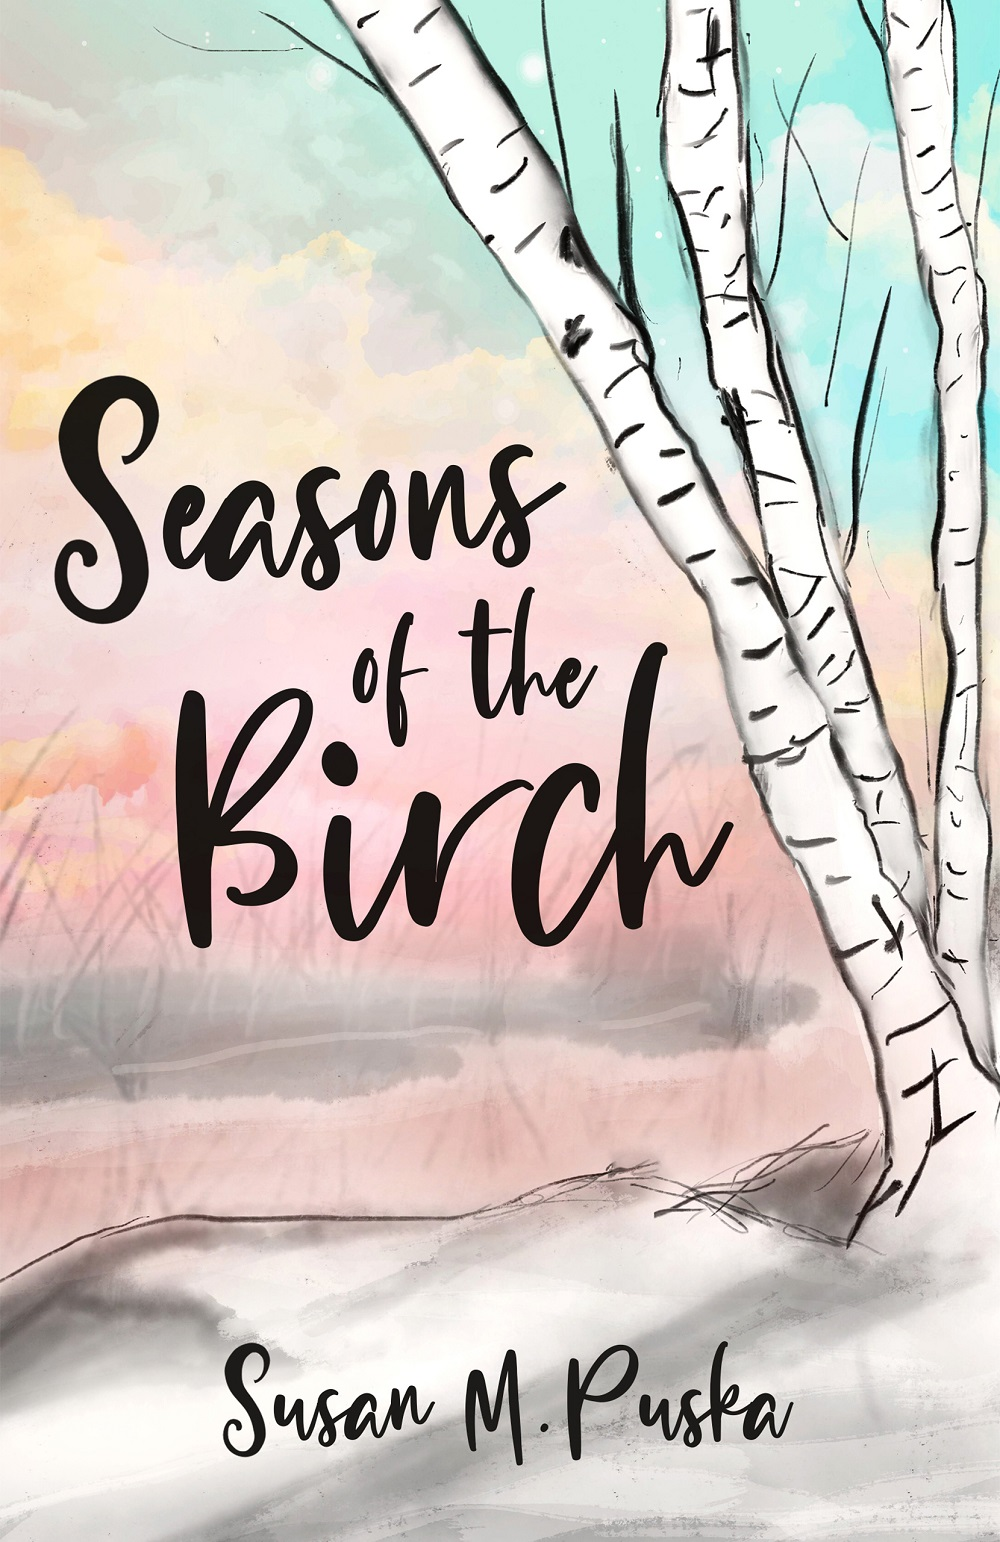 Seasons of the Birch Image